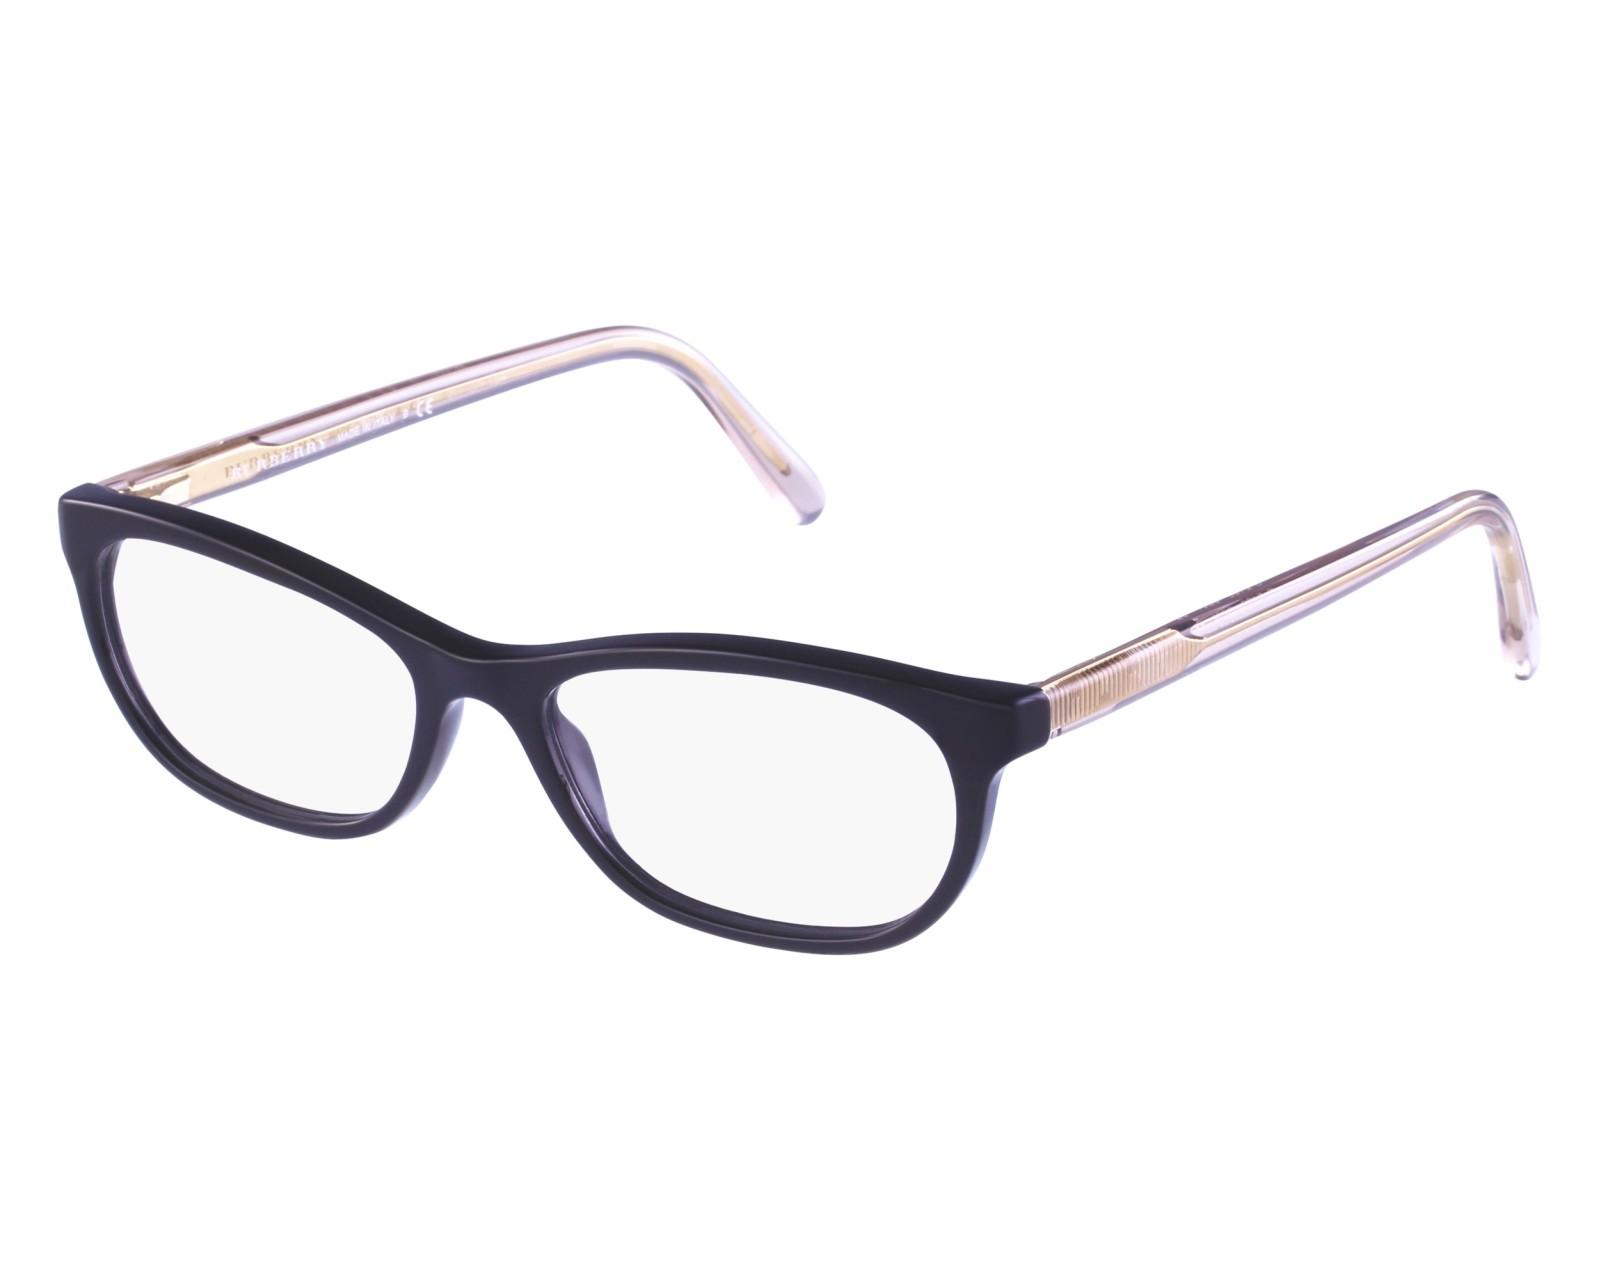 e365e74378 eyeglasses Burberry BE-2180 3507 52-16 Black Gold front view